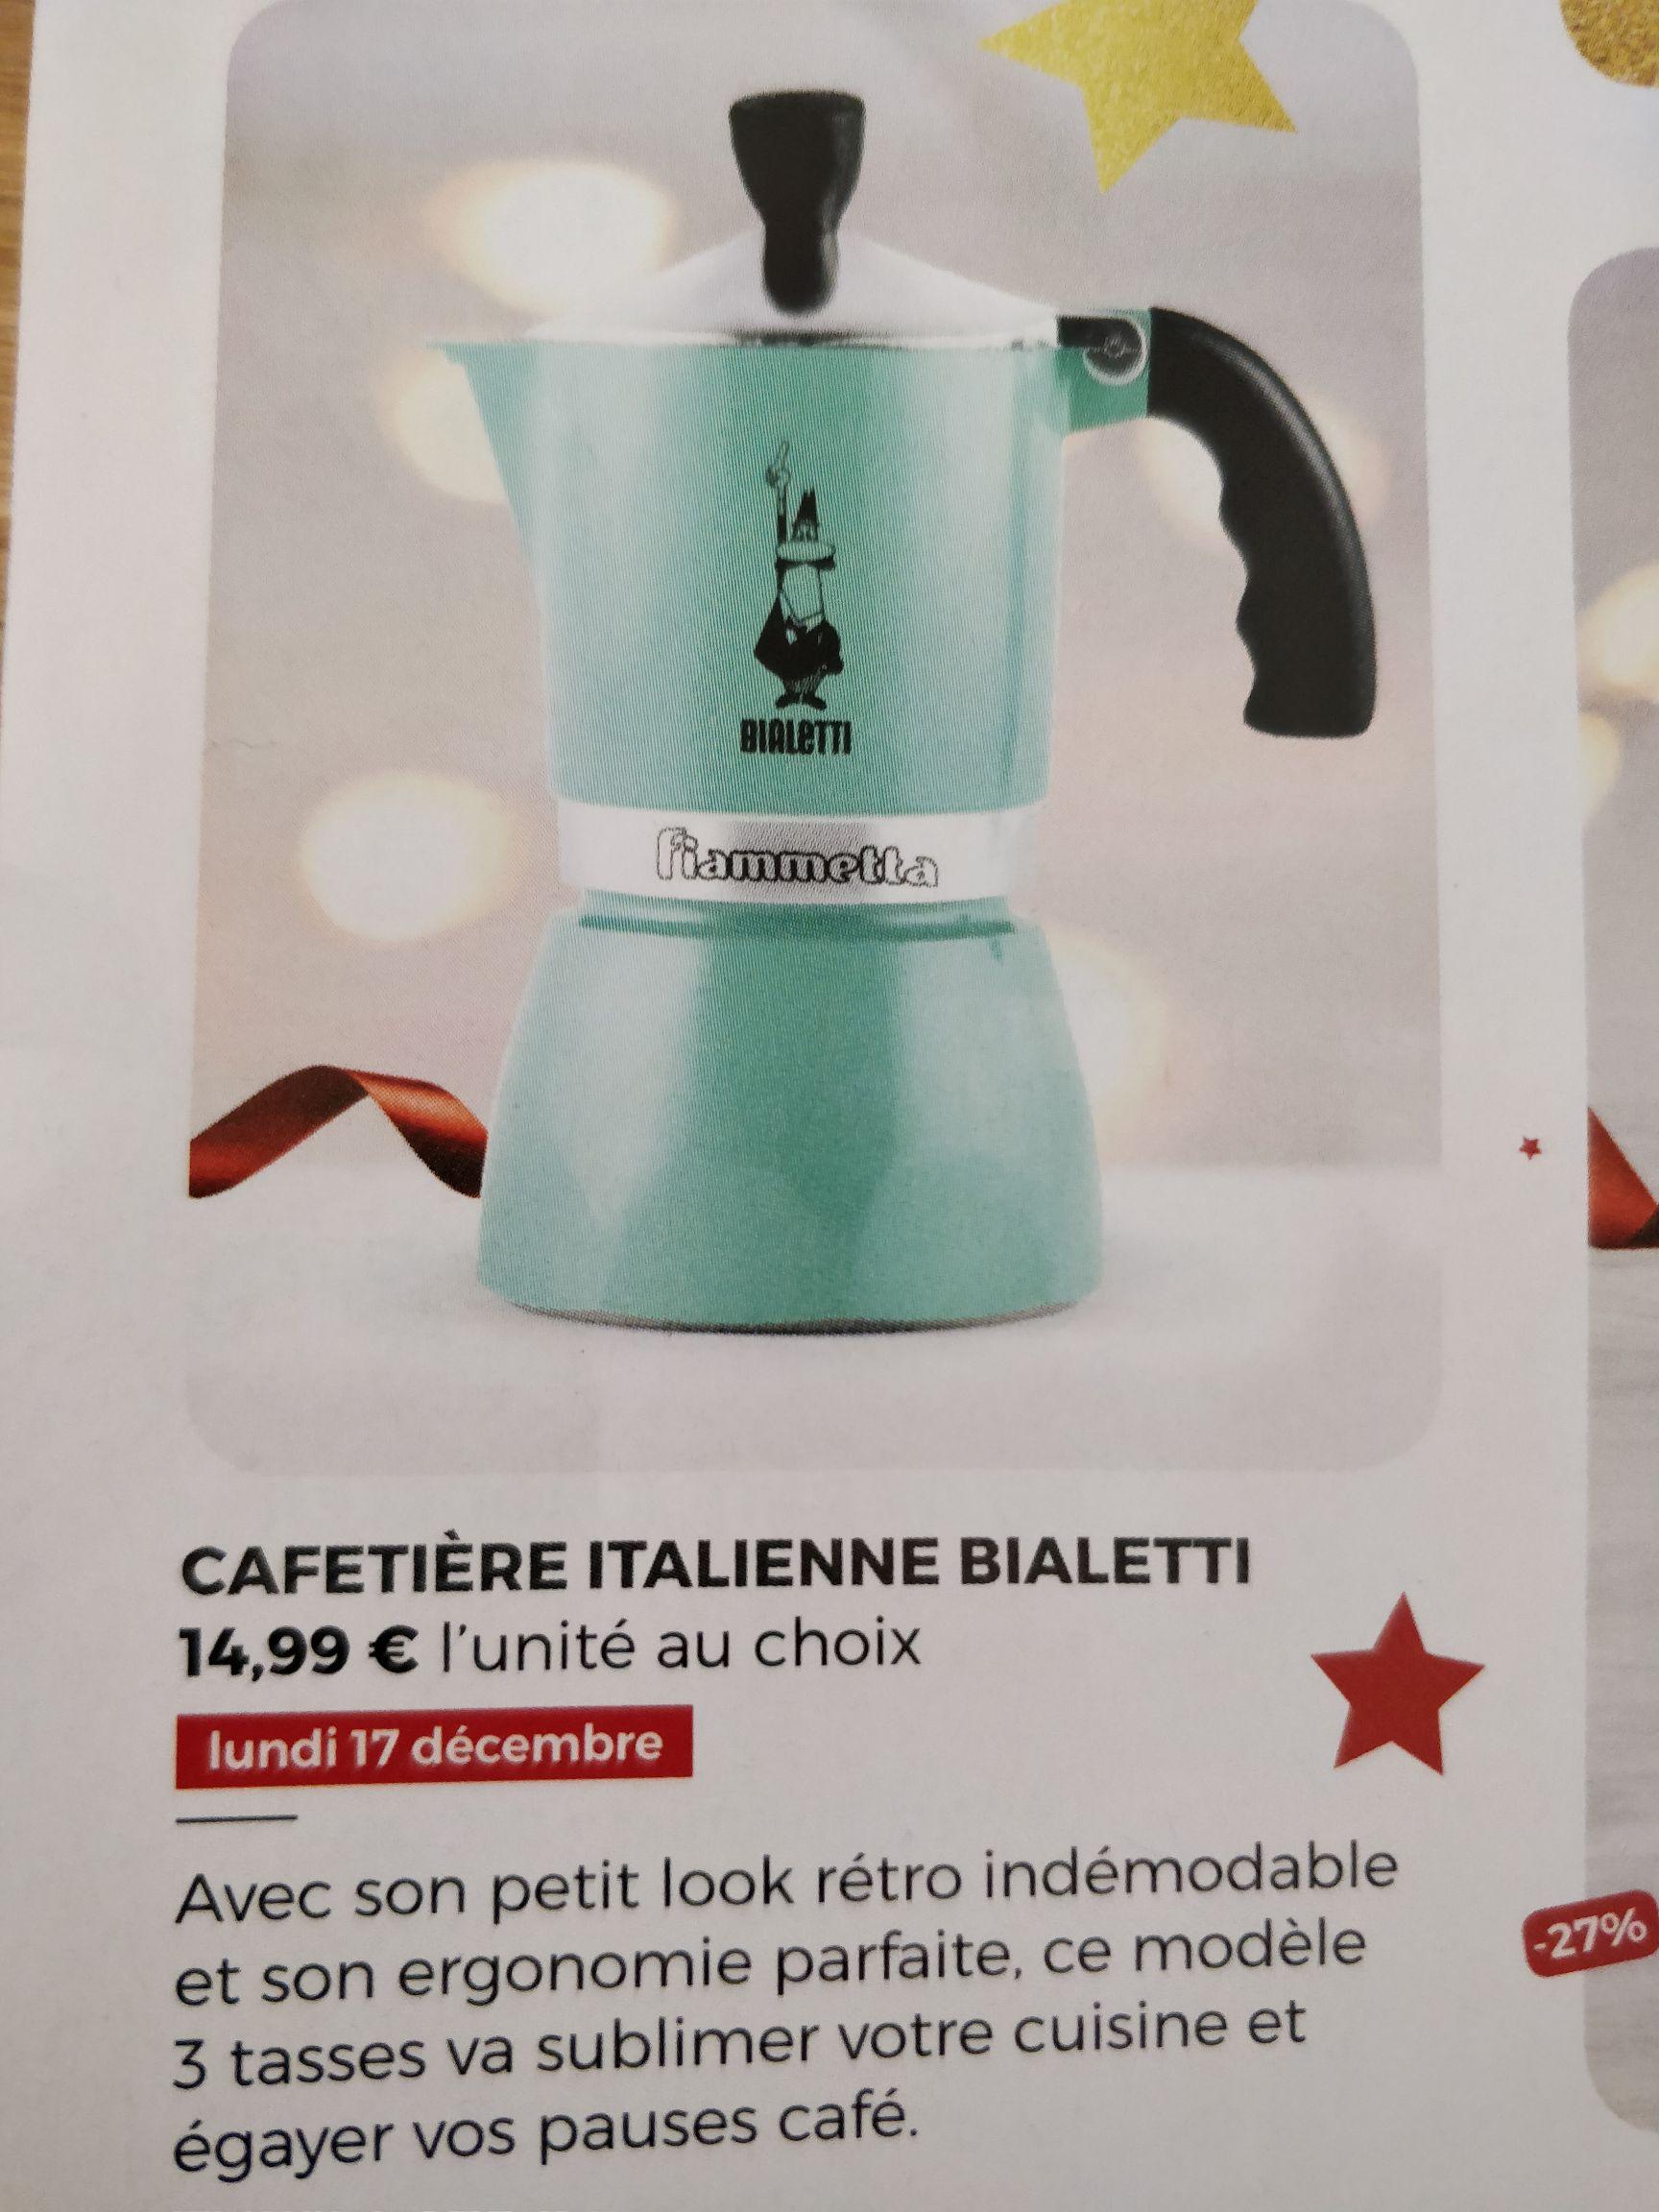 Cafetière italienne Bialetti